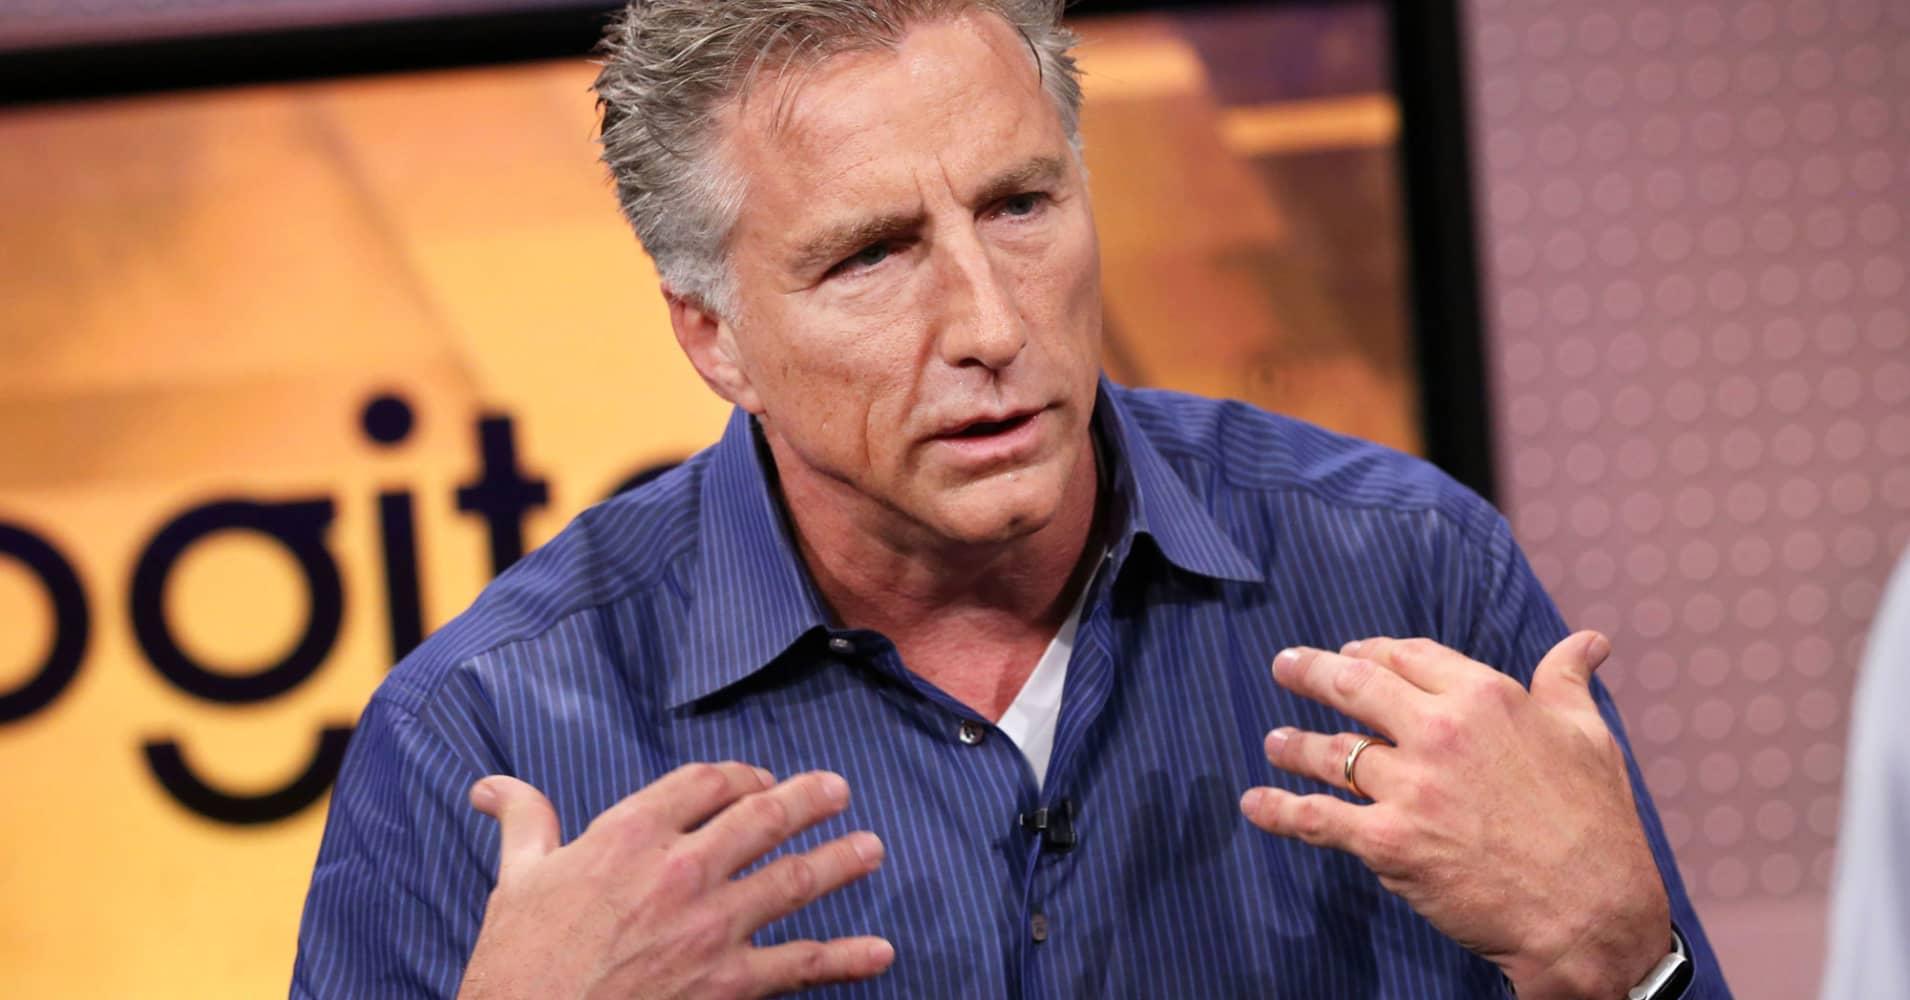 Logitech in talks to acquire headphone maker Plantronics: Reuters, citing sources